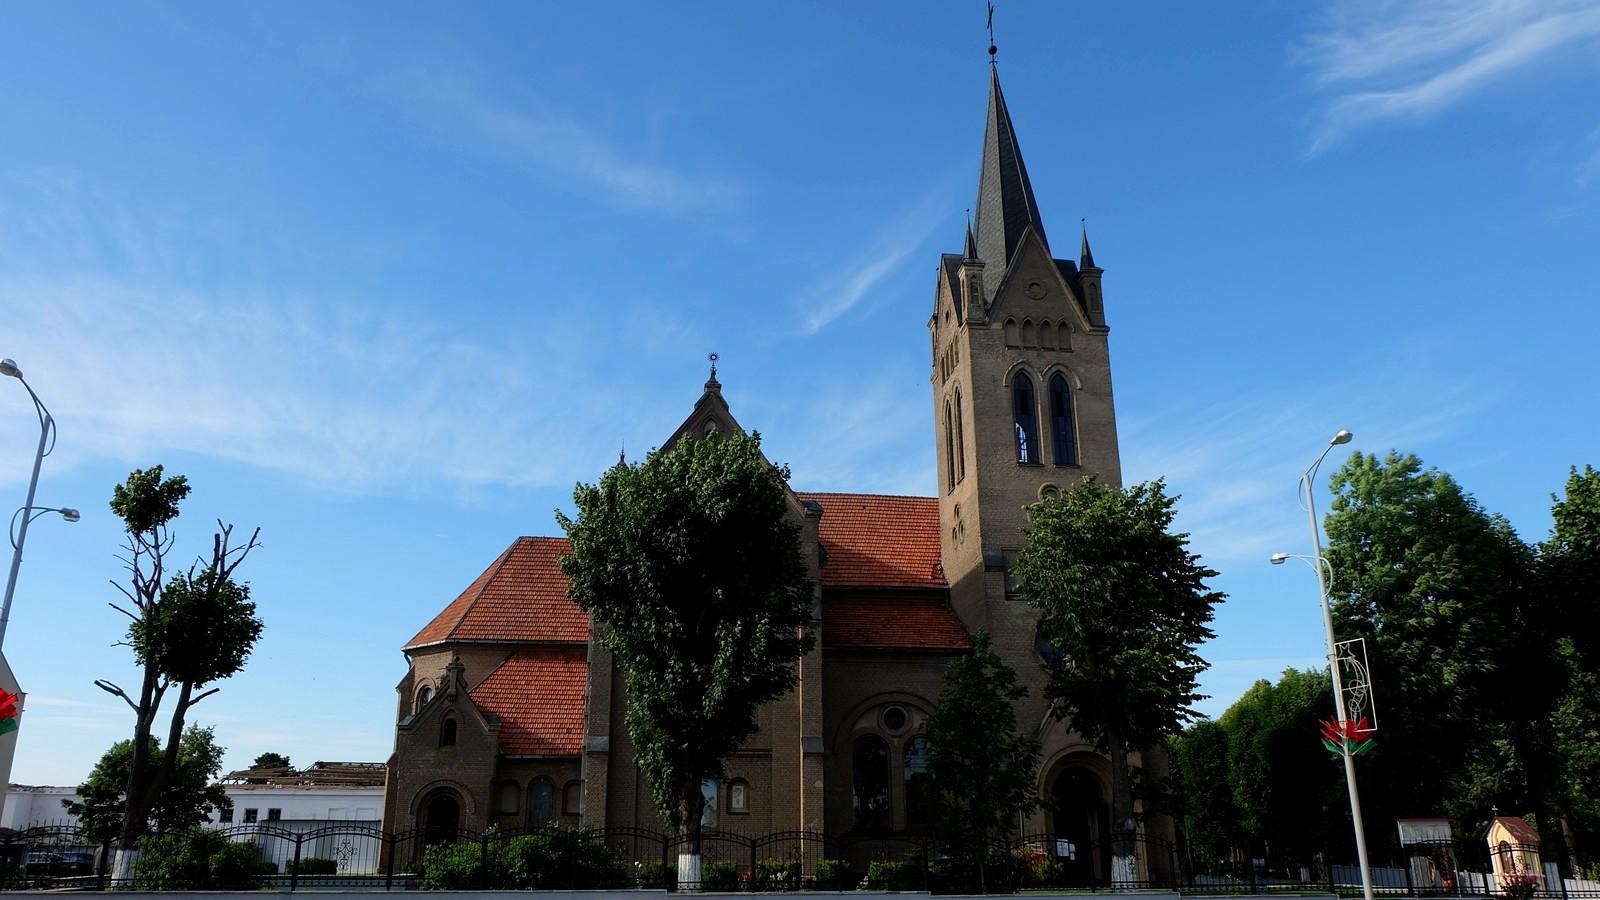 Костёл Воздвижения Святого Креста, Вилейка, Беларусь